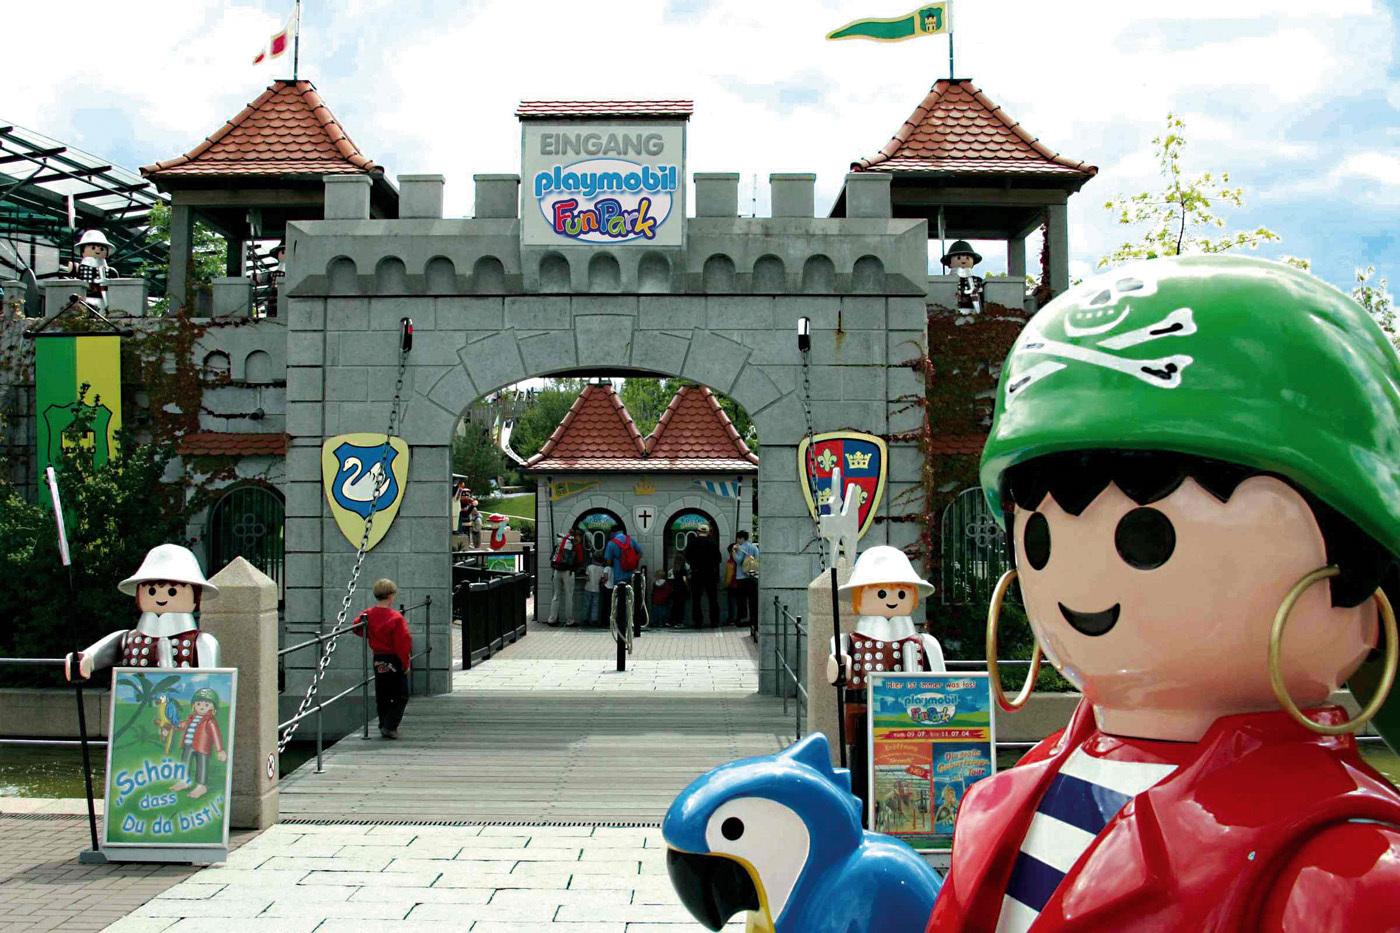 Playmobil fun park hours